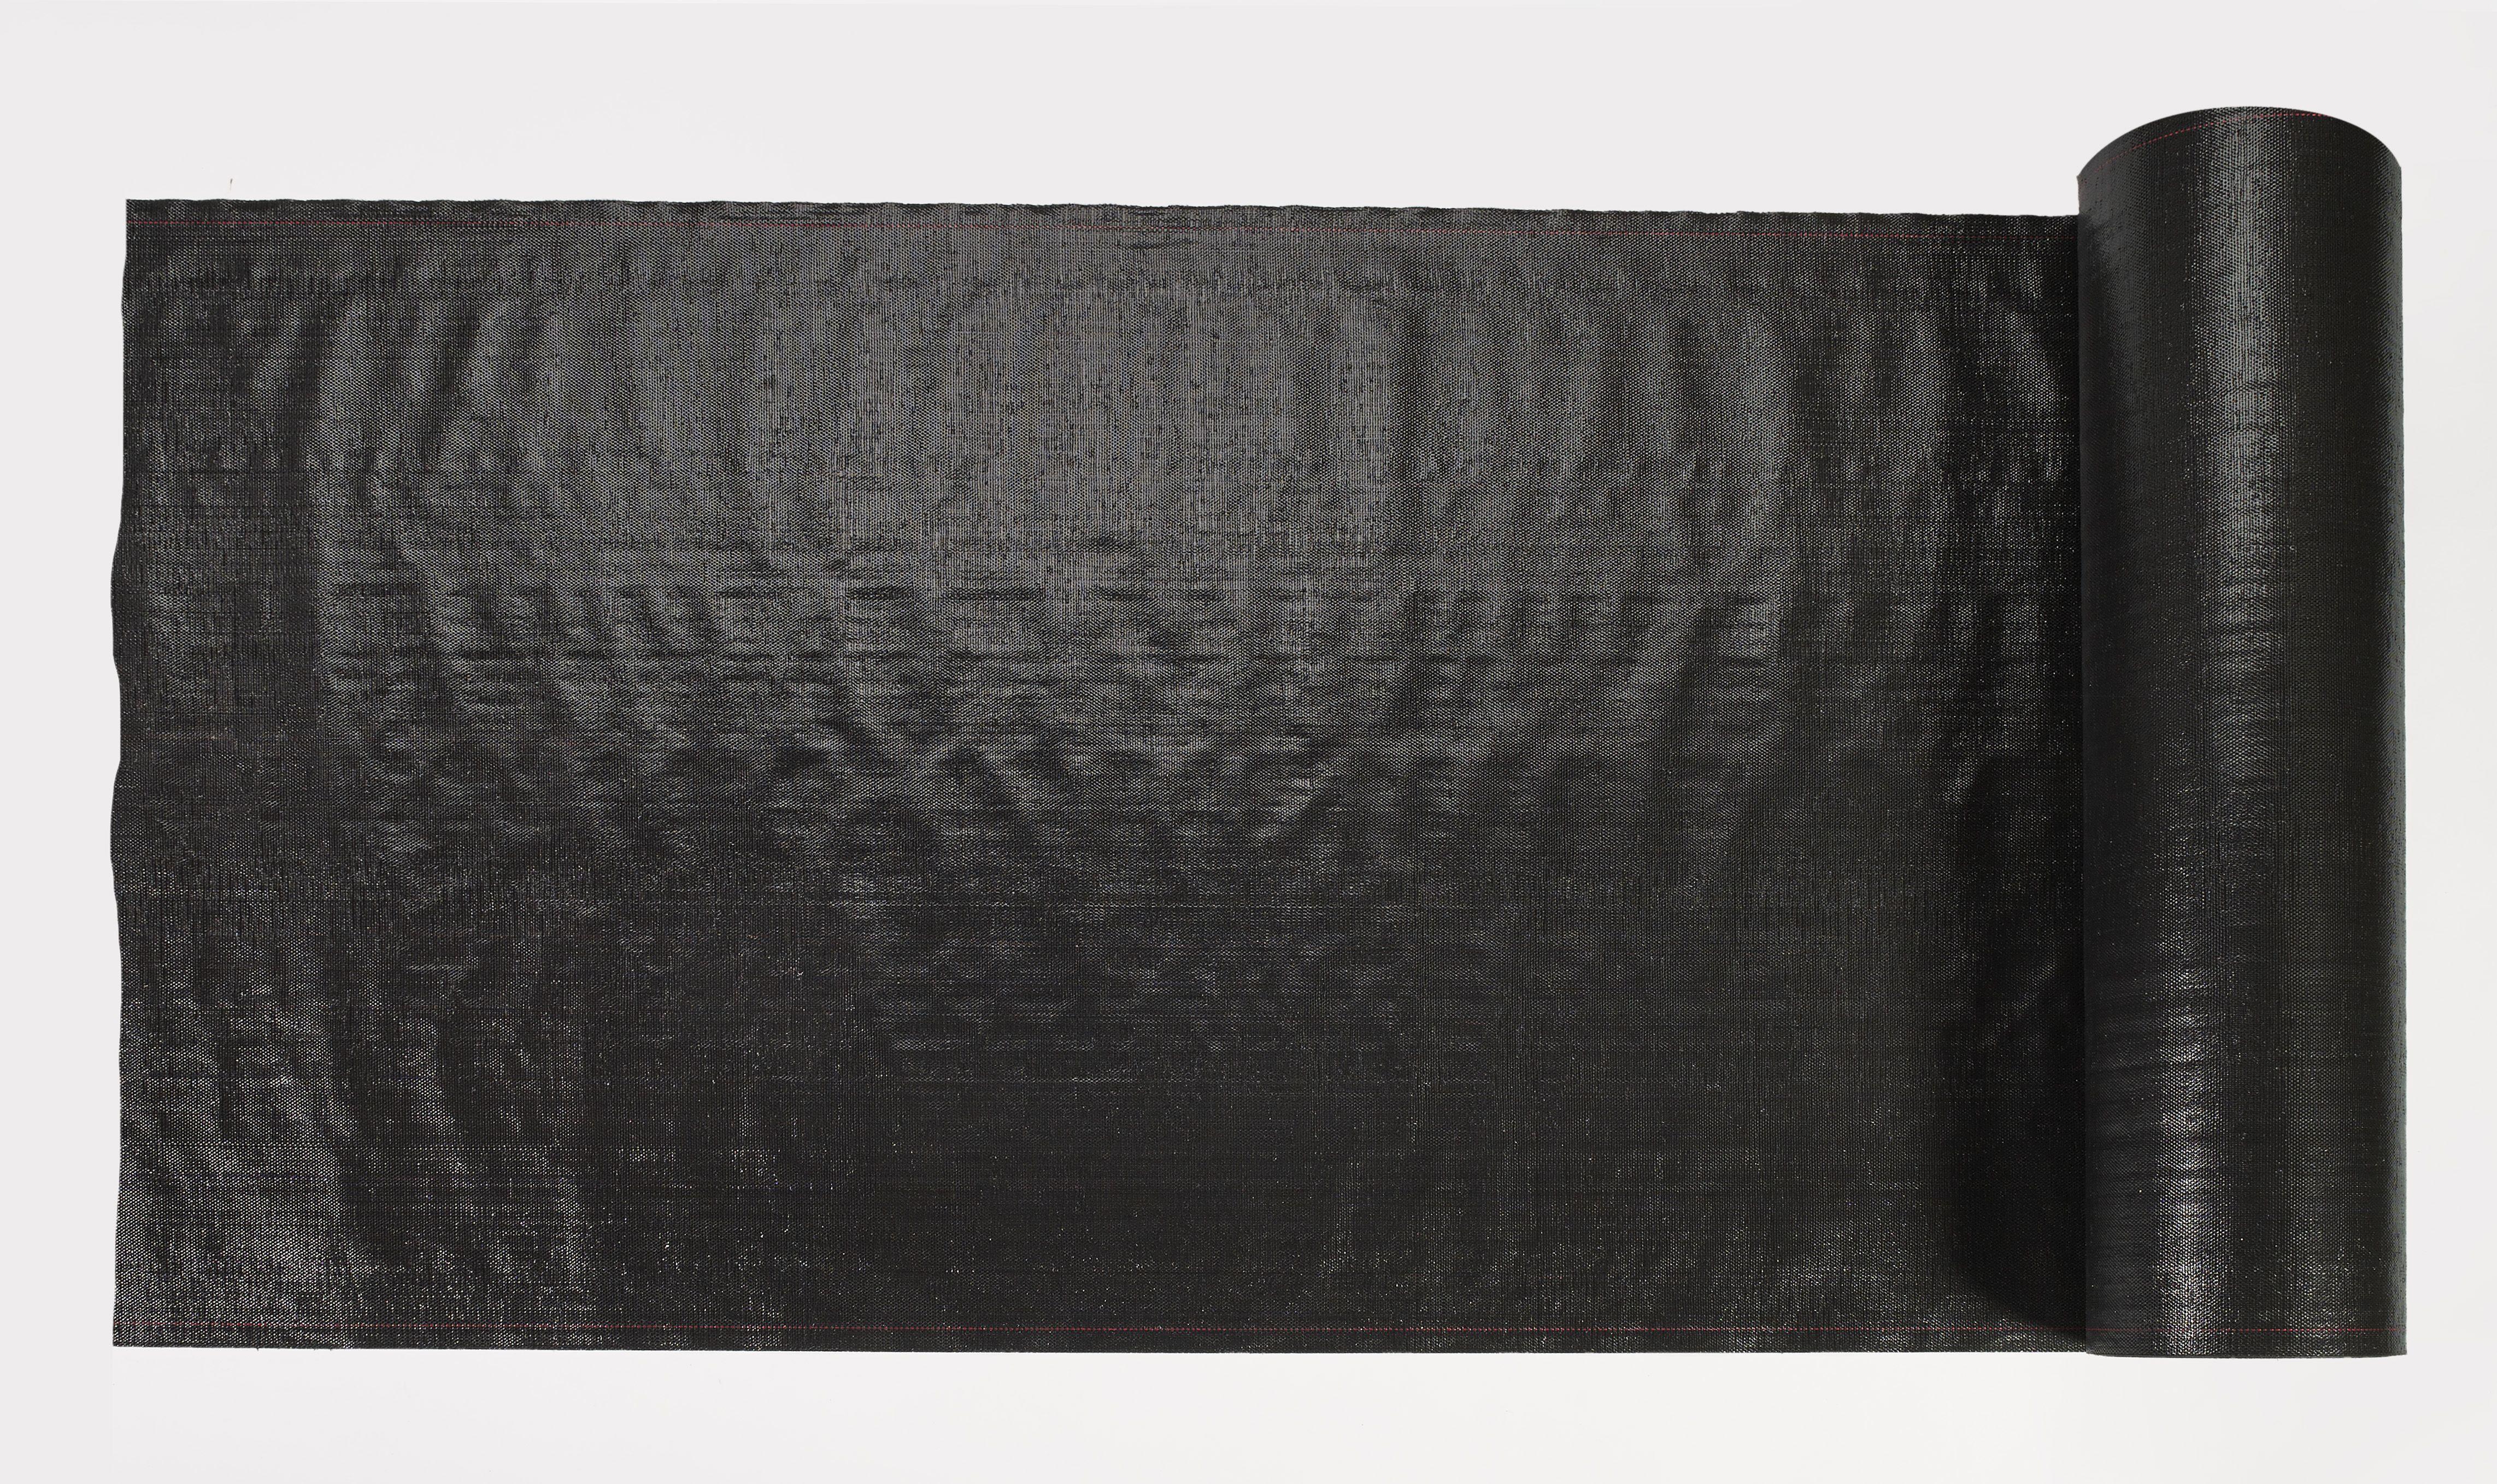 Cotton Length 5 Mutual Industries 00356-00000-7125 Kromer Jelly Bean Style Welder Cap 7 1// 8 Width 6